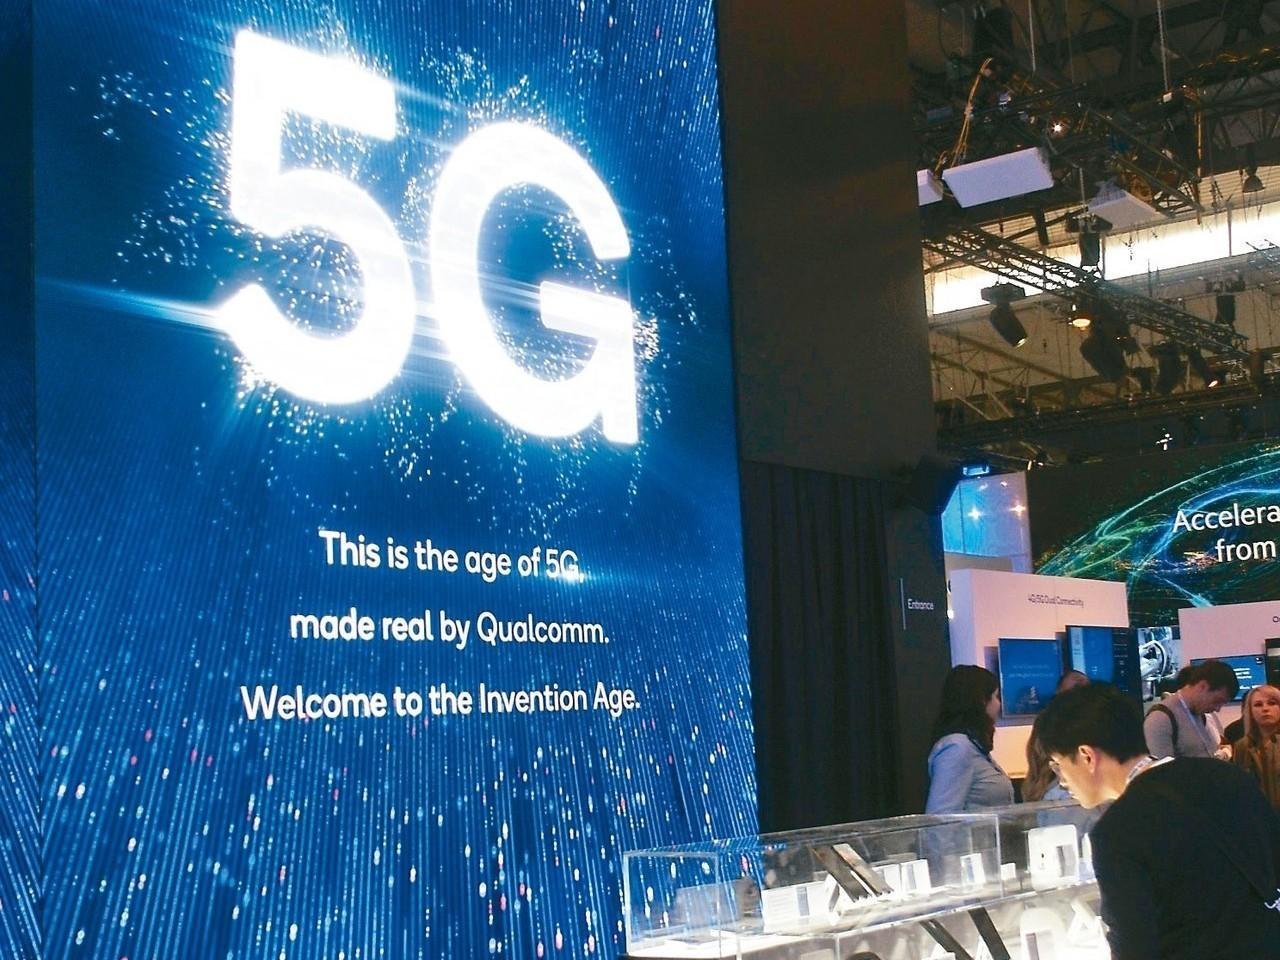 5G首波釋照原訂2020年上半年完成,遭批腳步太慢。 圖/聯合報系資料照片